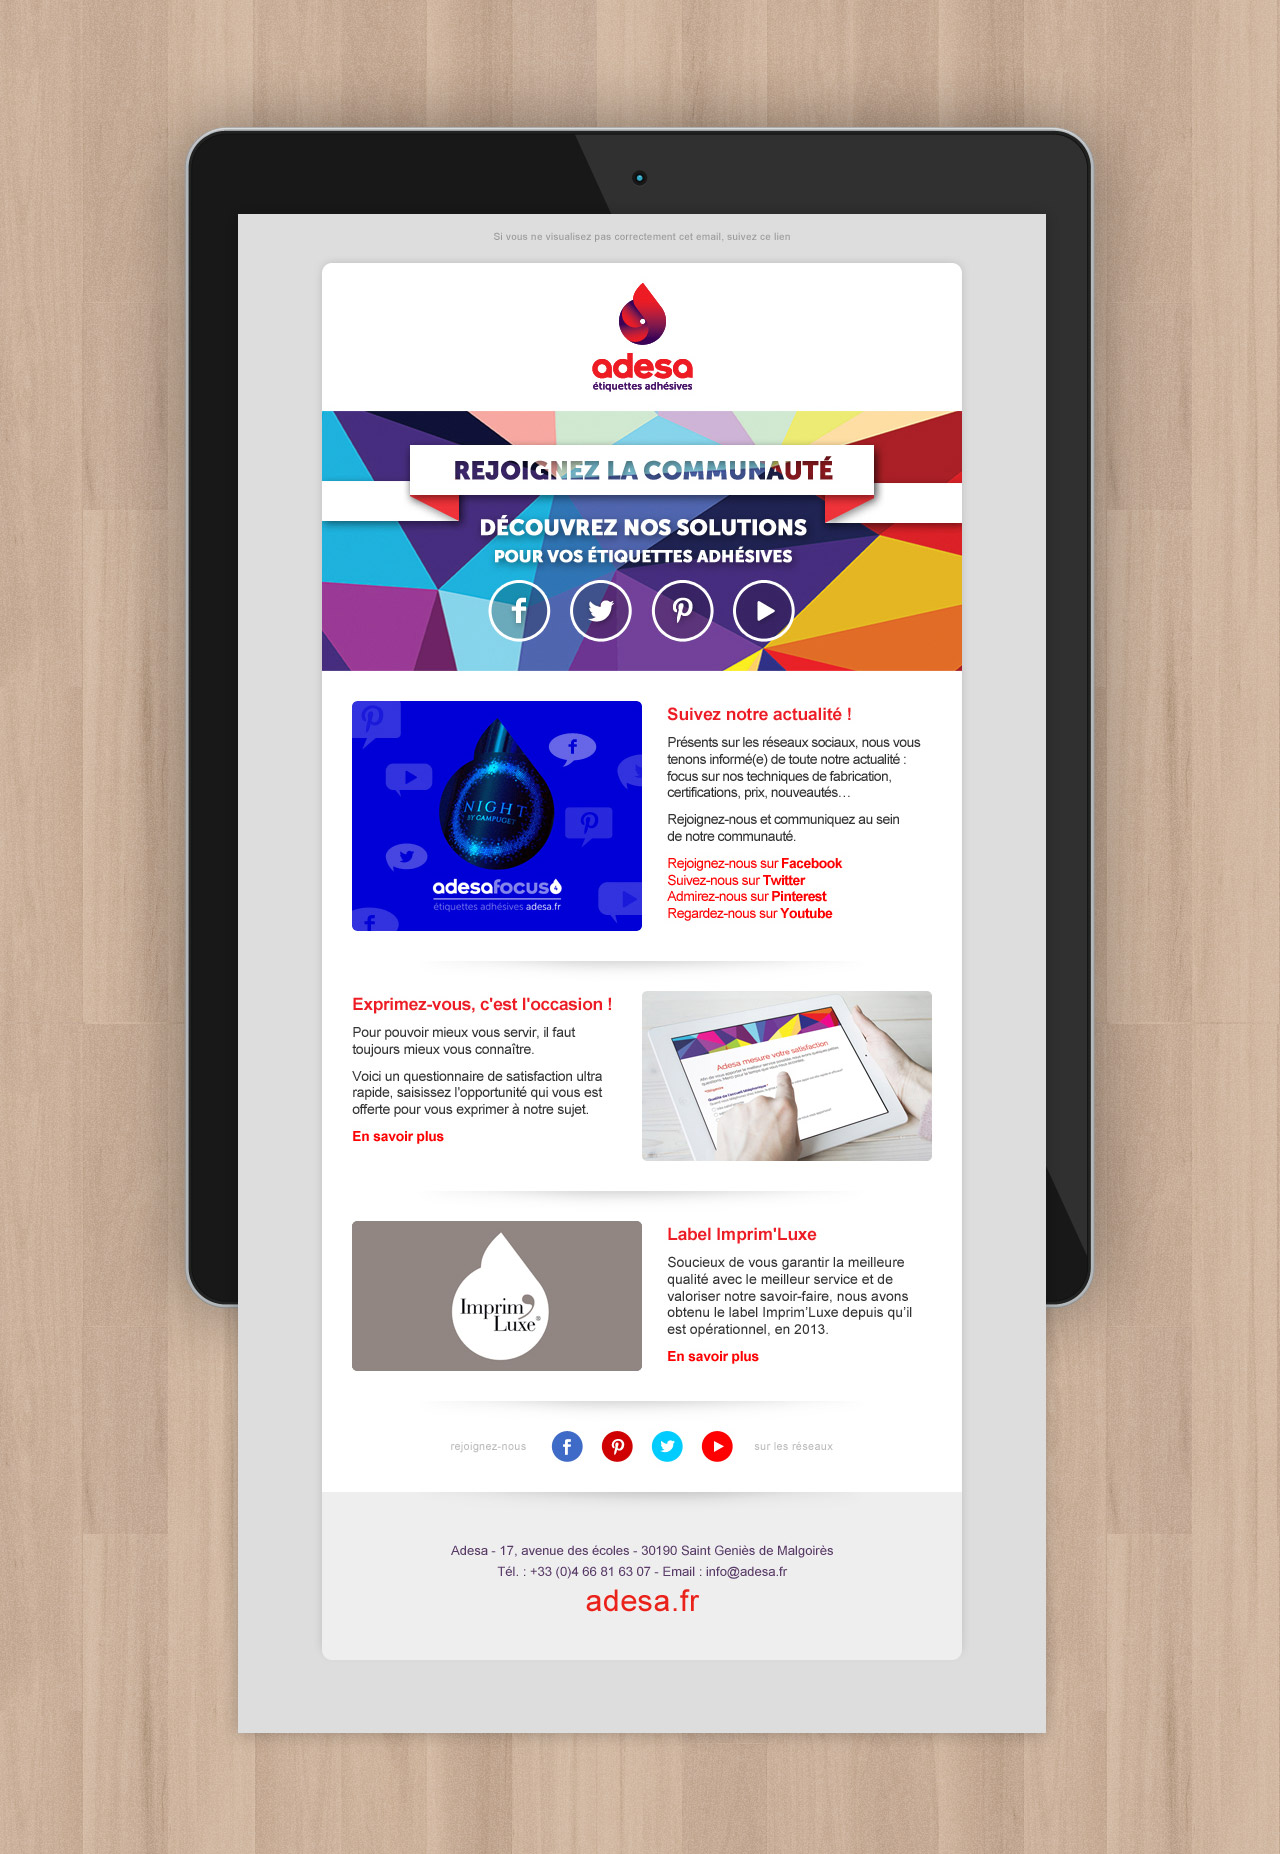 adesa-newsletter-avril-2015-design-creation-communication-caconcept-alexis-cretin-graphiste